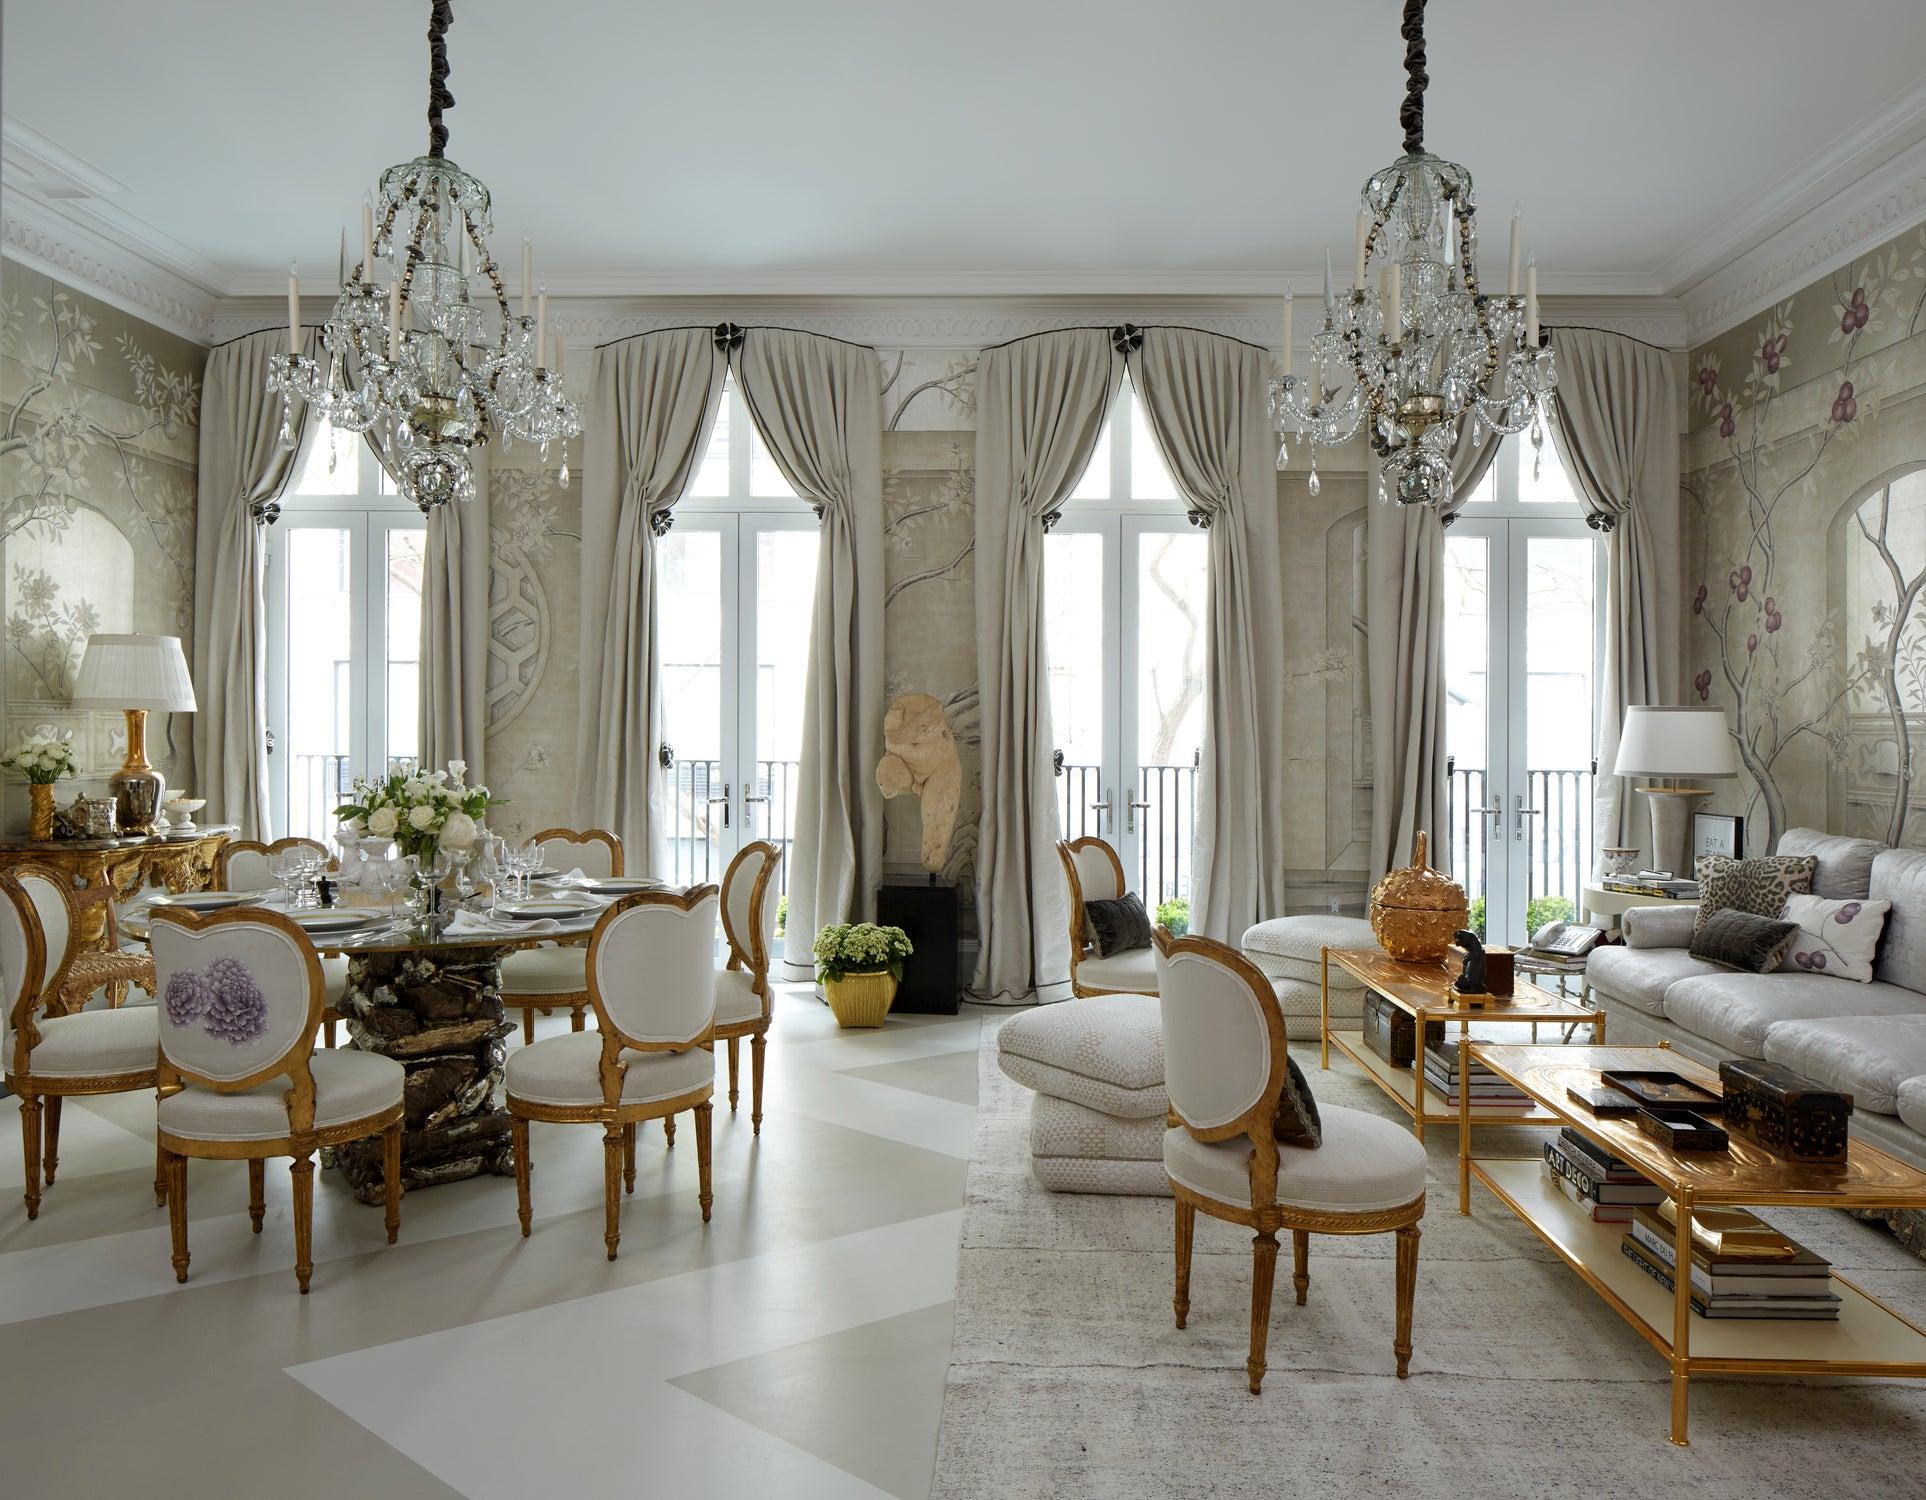 Dining Room By Alex Papachristidis Kips Bay Decorator Show House On 1stdibs